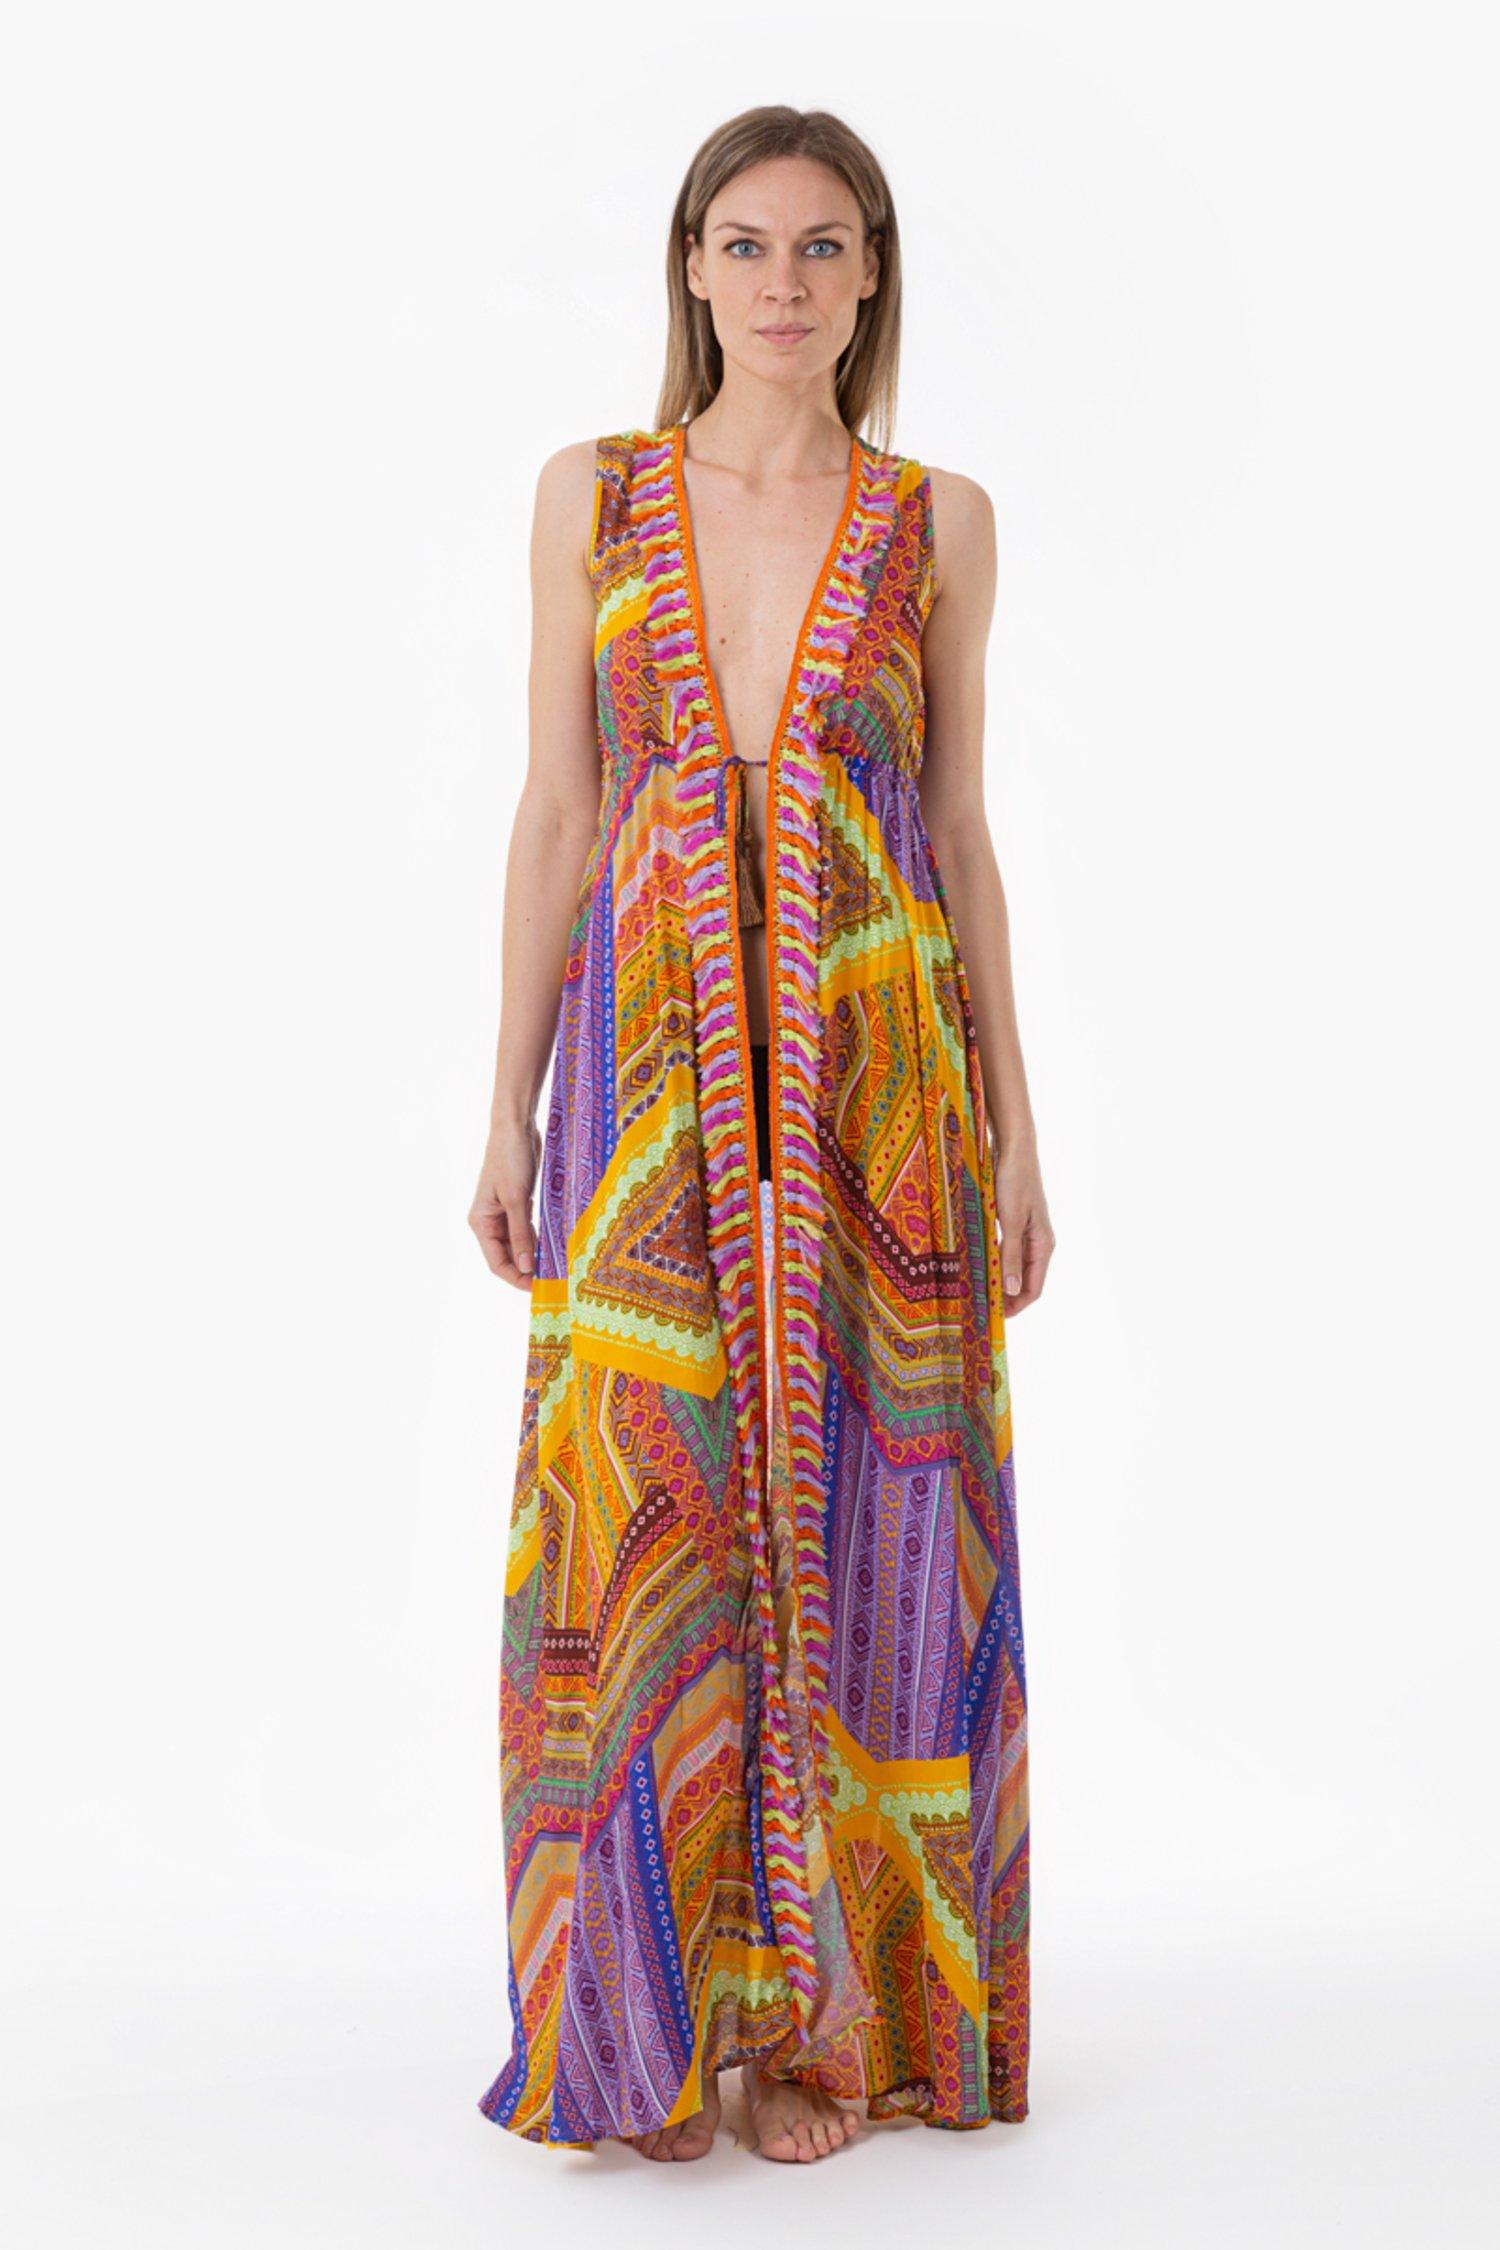 LONG DRESS WITH MULTICOLORED FRINGES - Orange